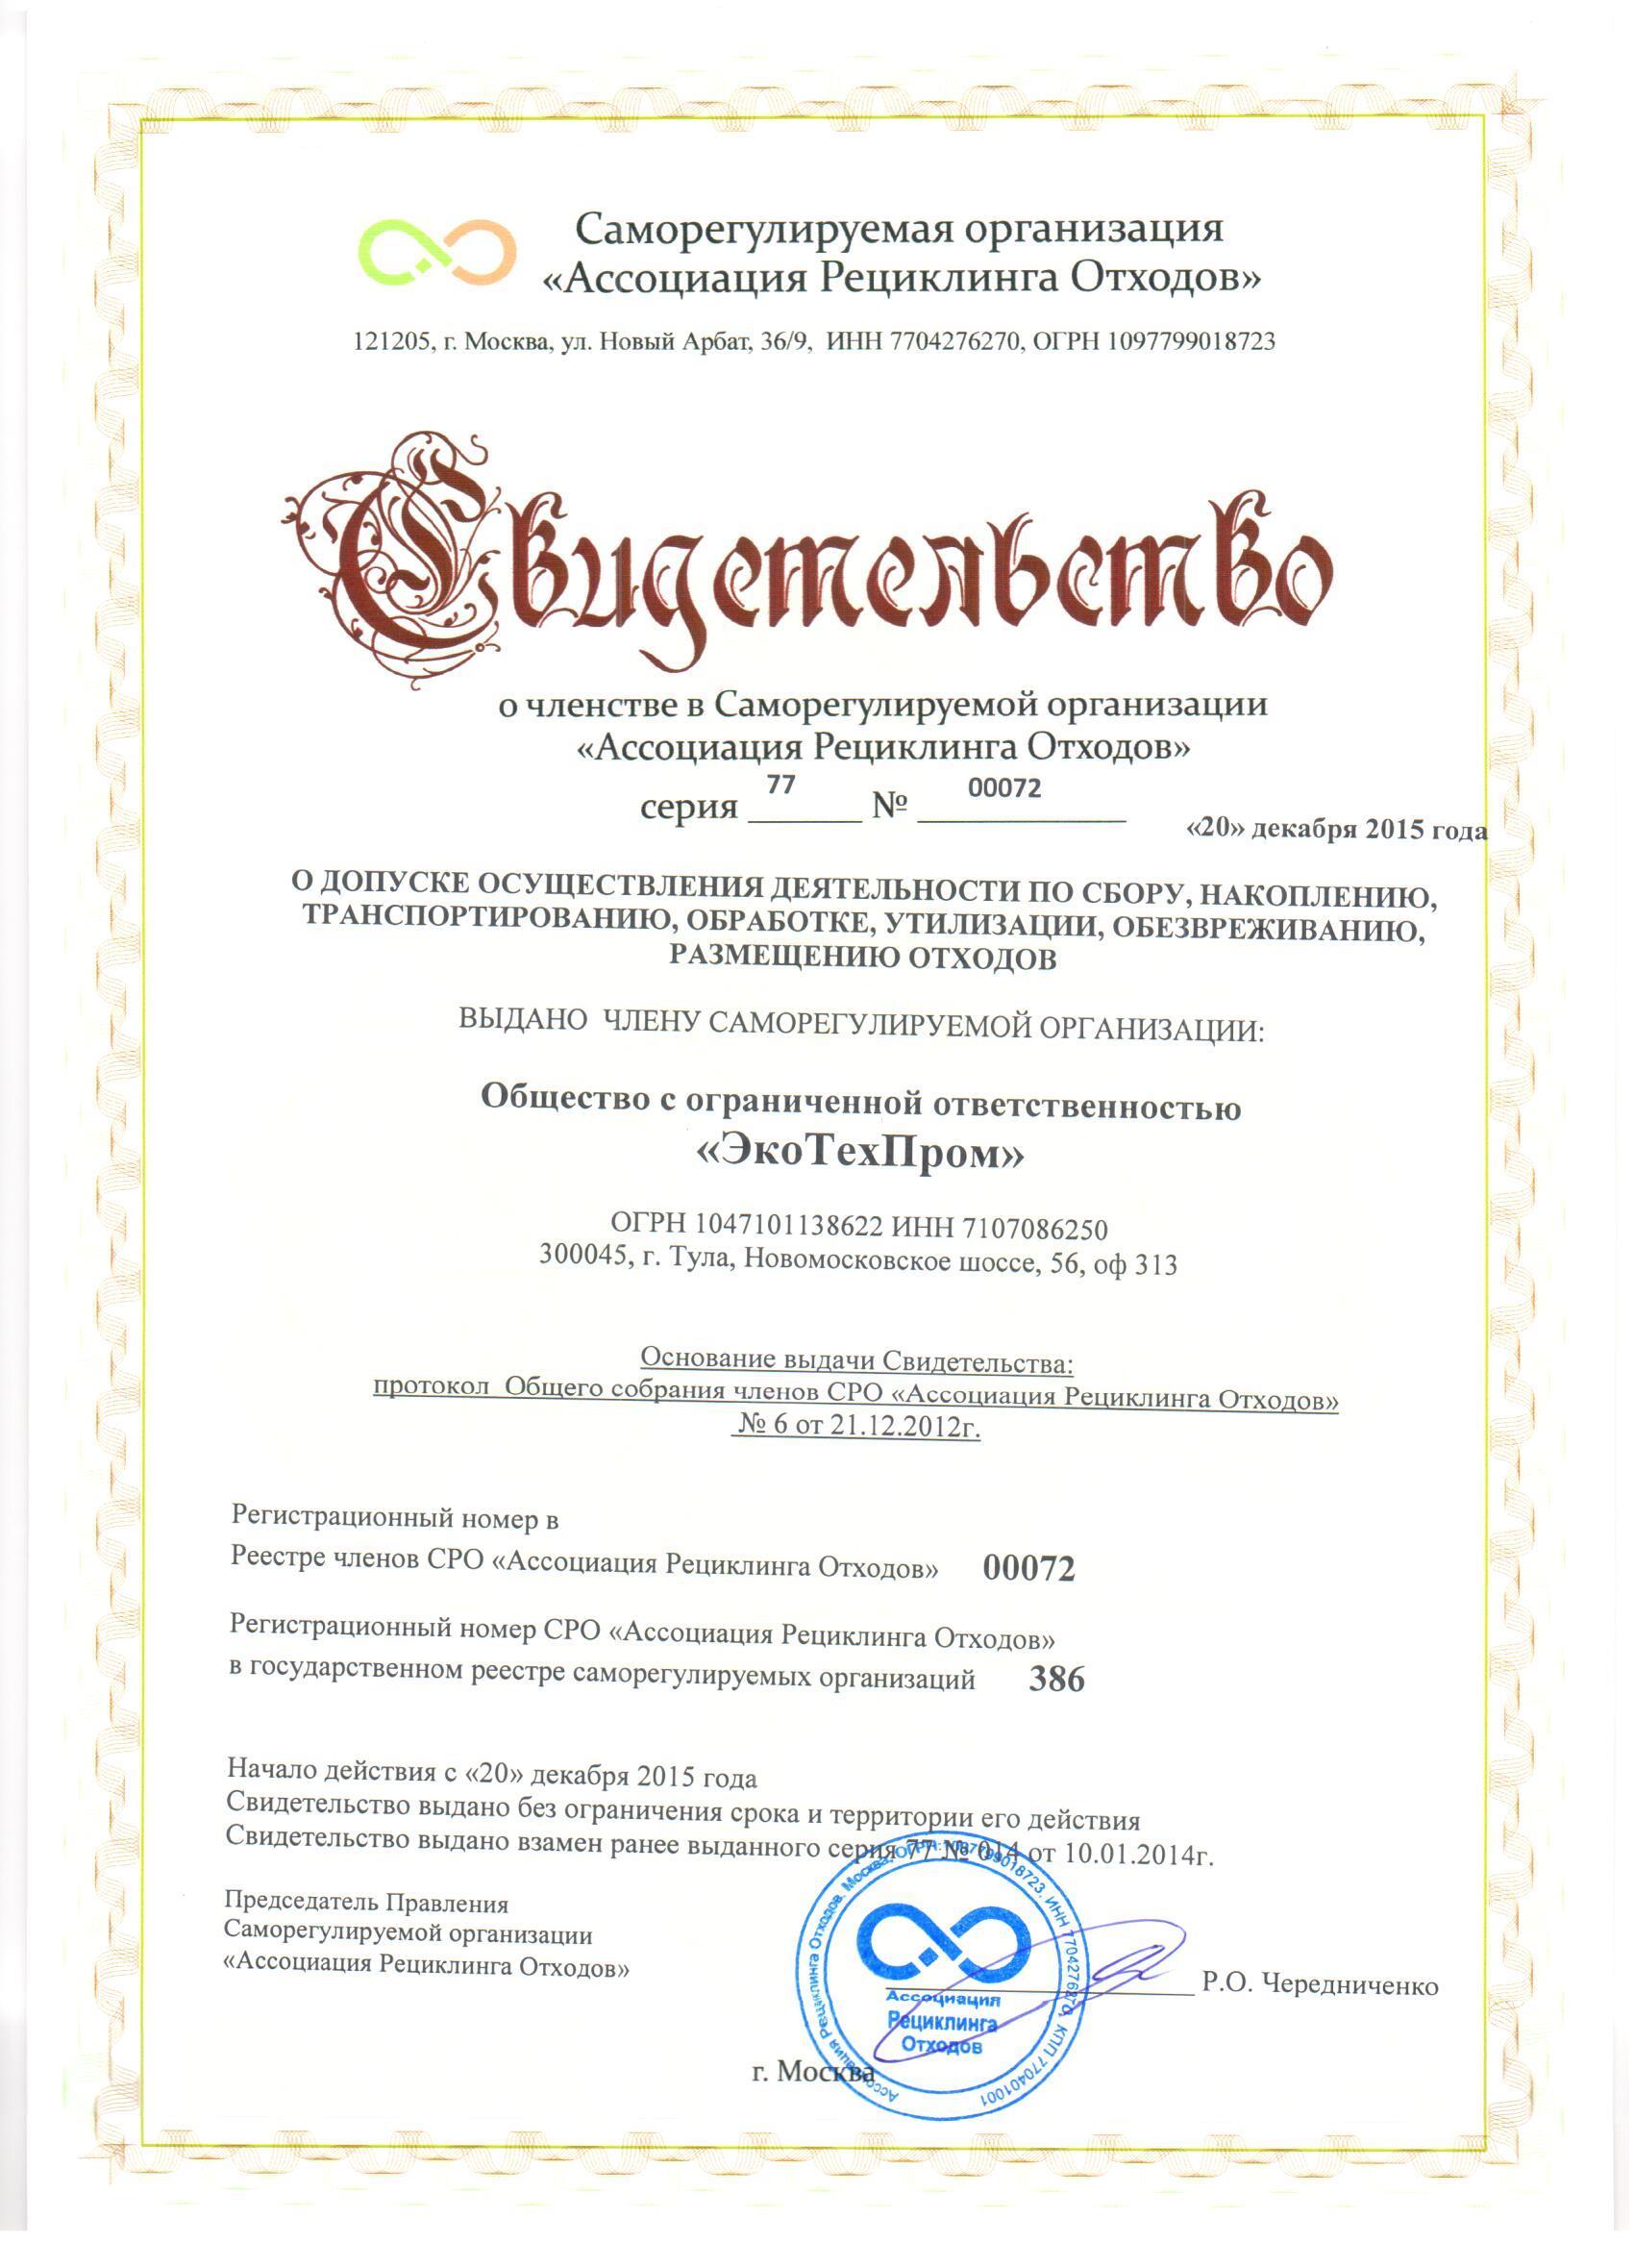 EcoTehProm-Tula_sro_ARO